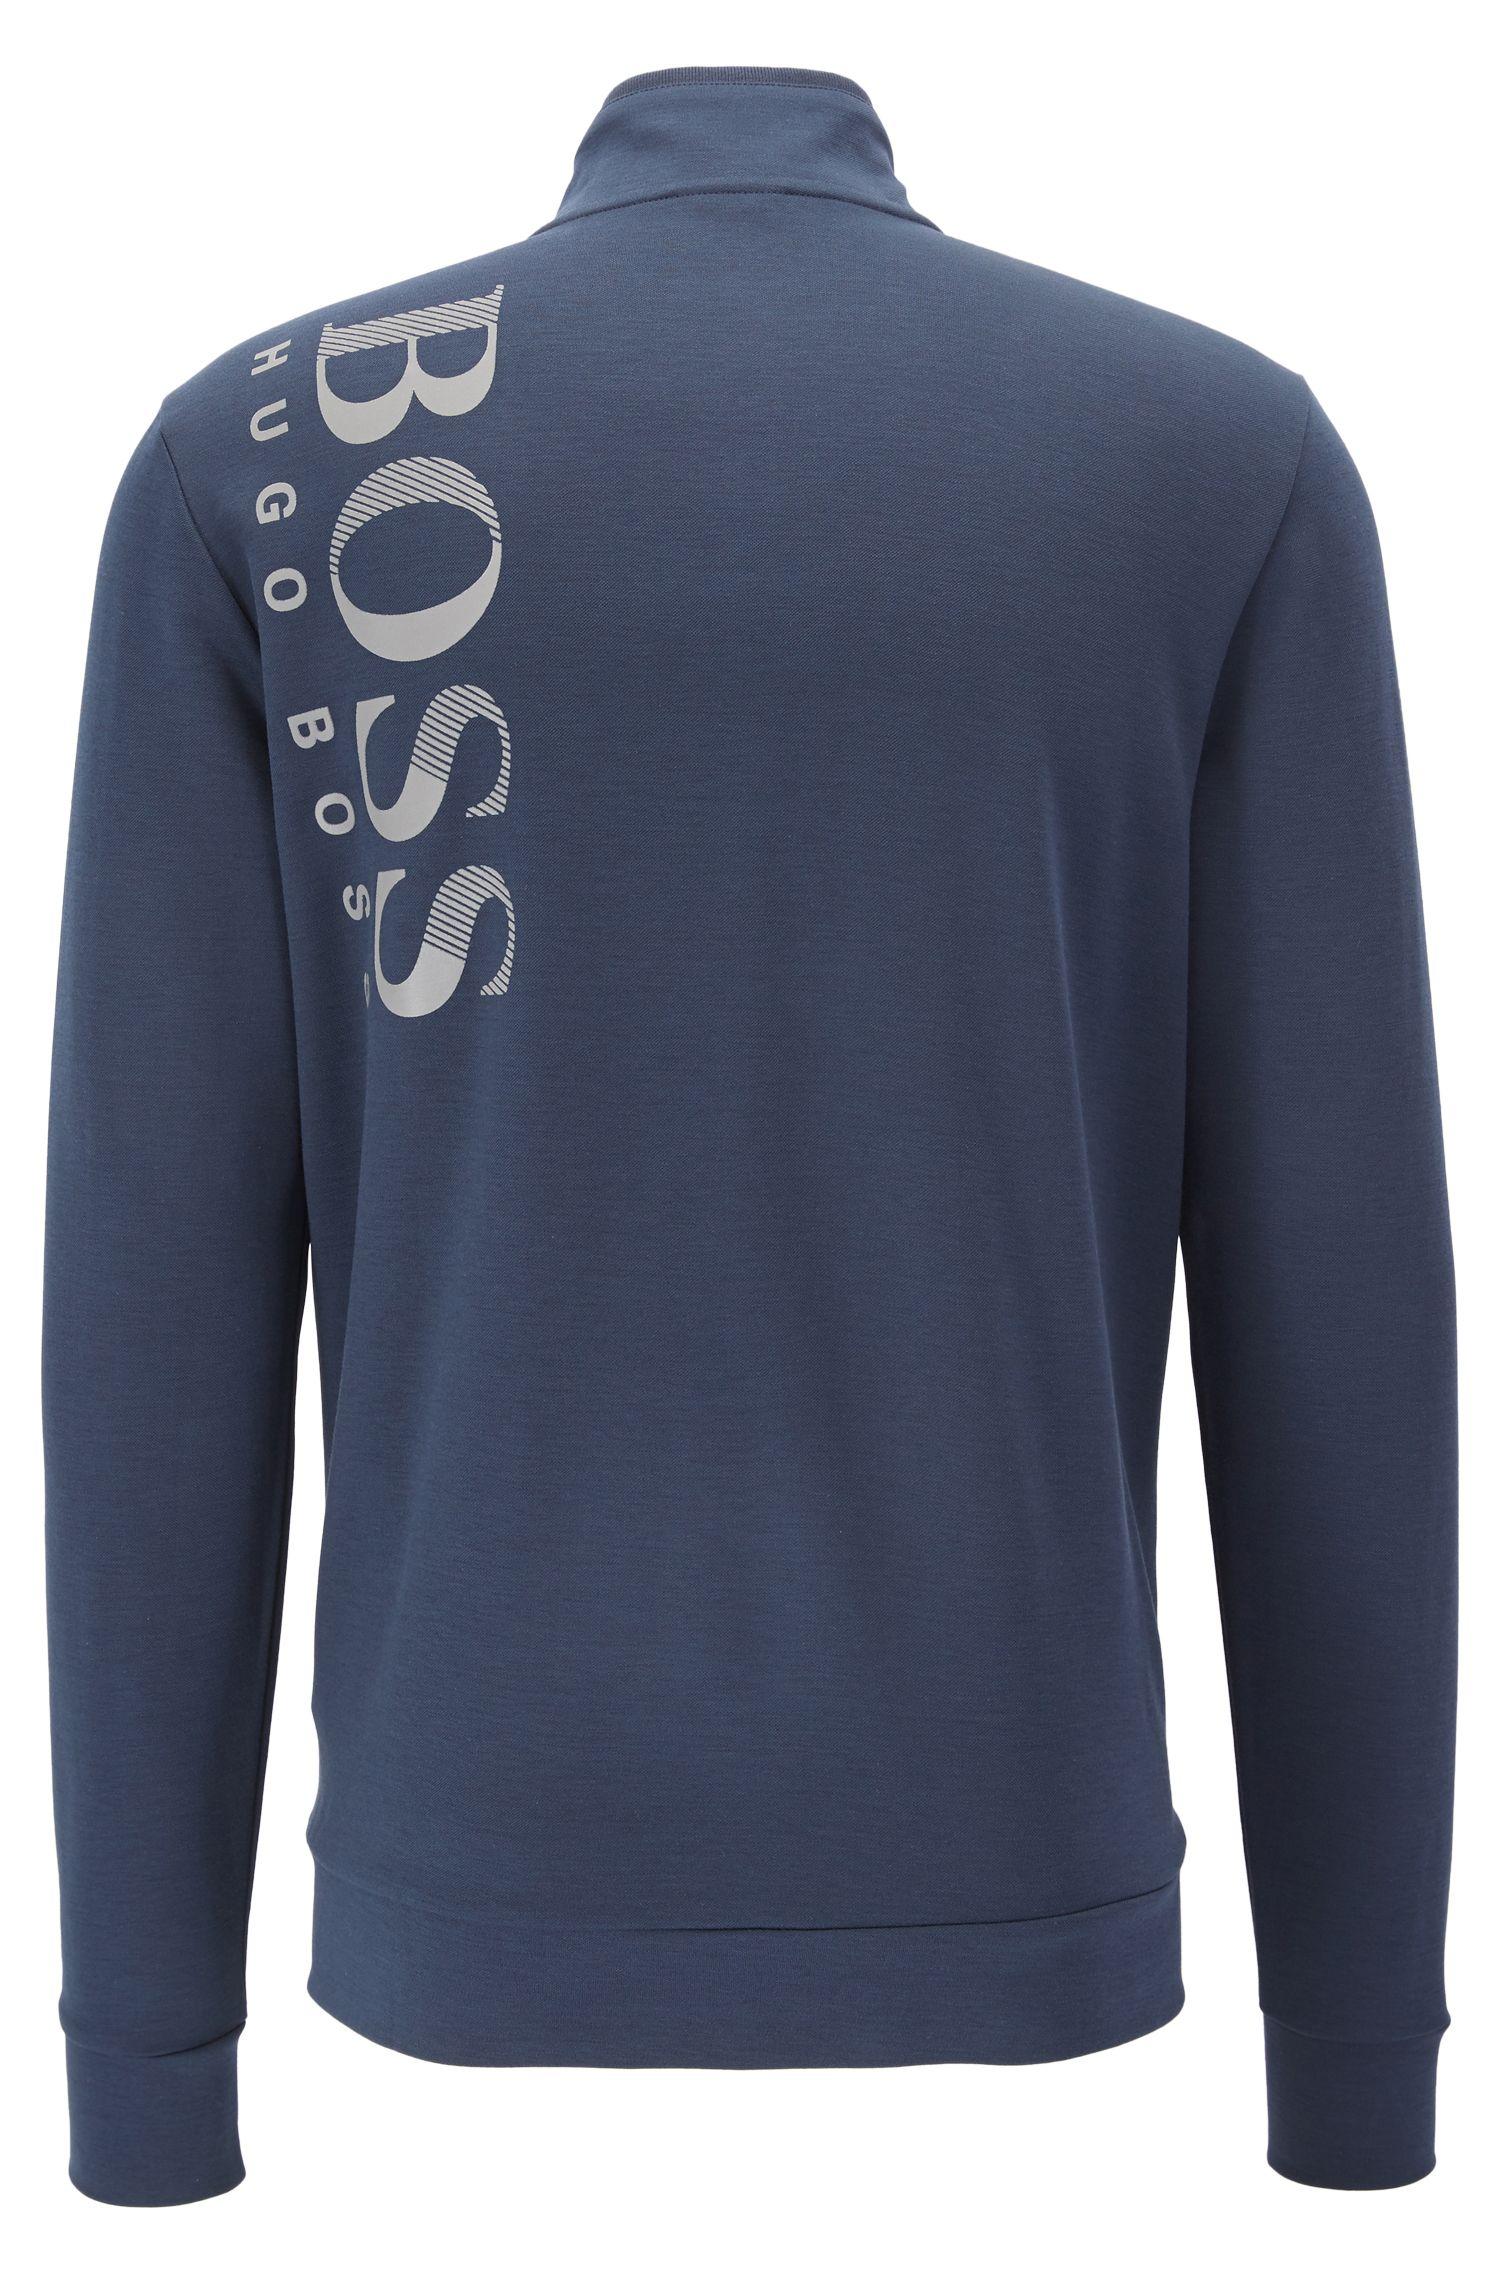 Cotton Blend Sweat Jacket   SL Tech , Dark Blue